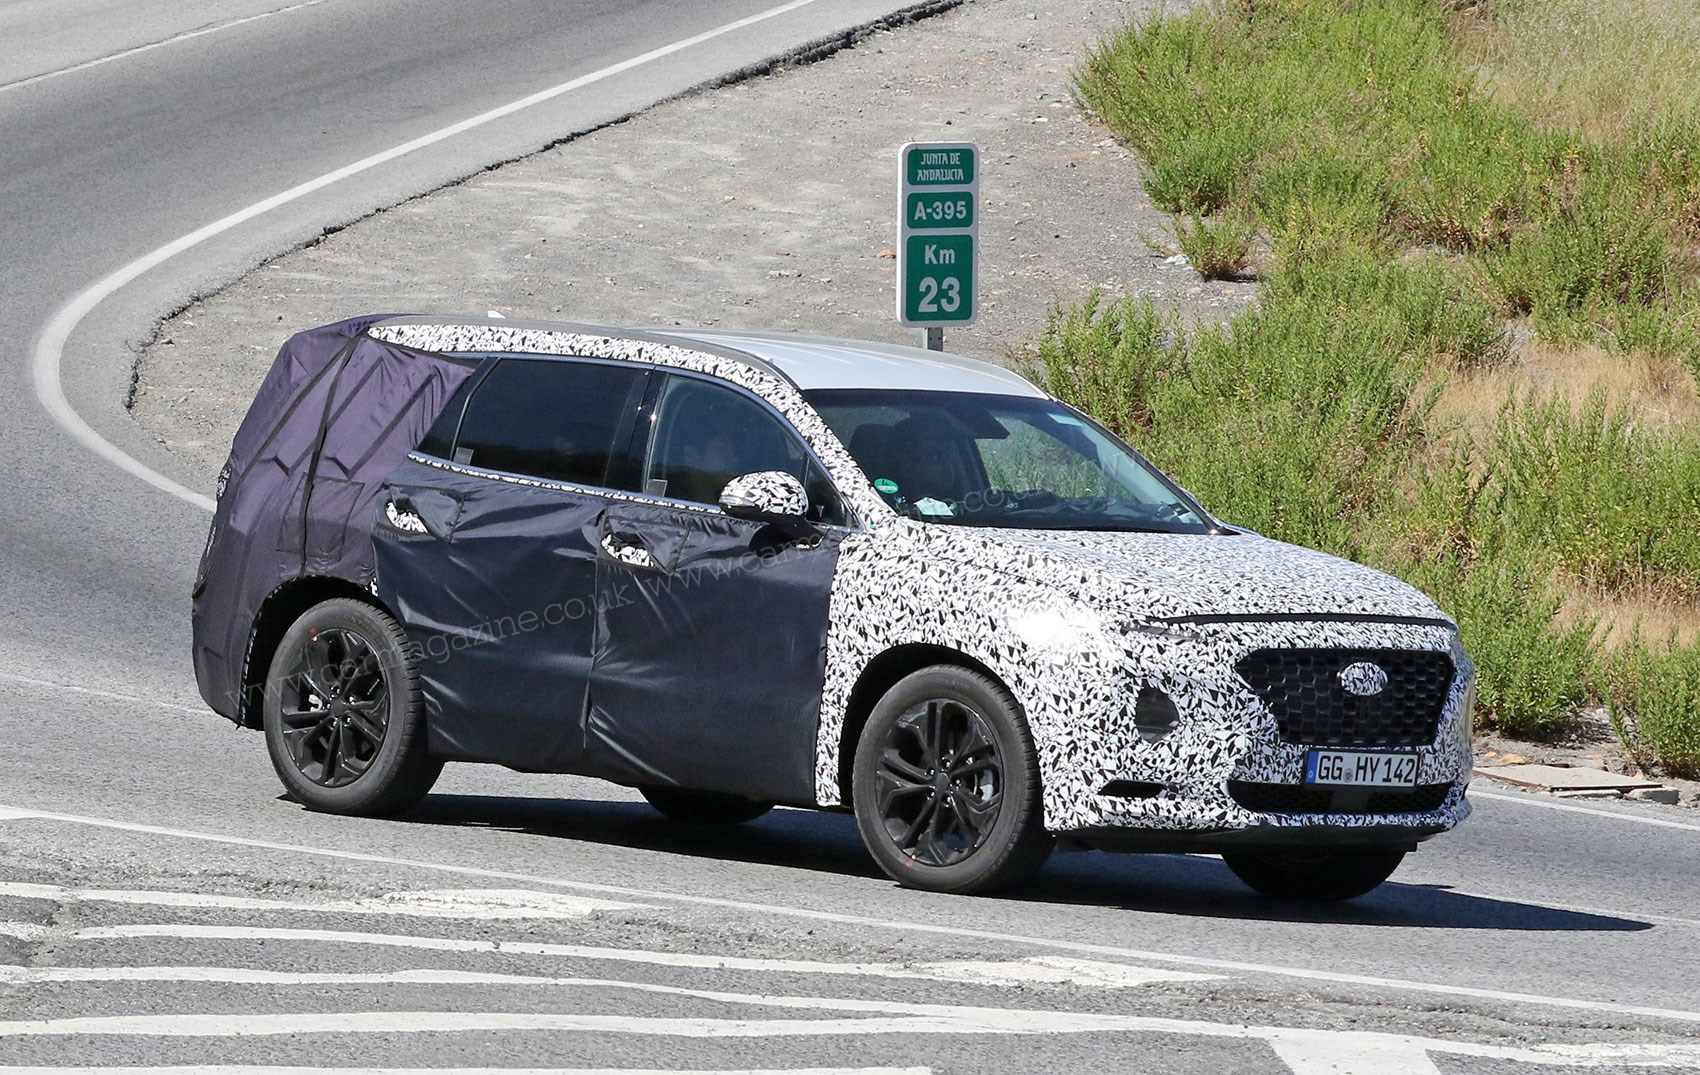 New 2018 Hyundai Santa Fe spy photos specs prices | CAR ...